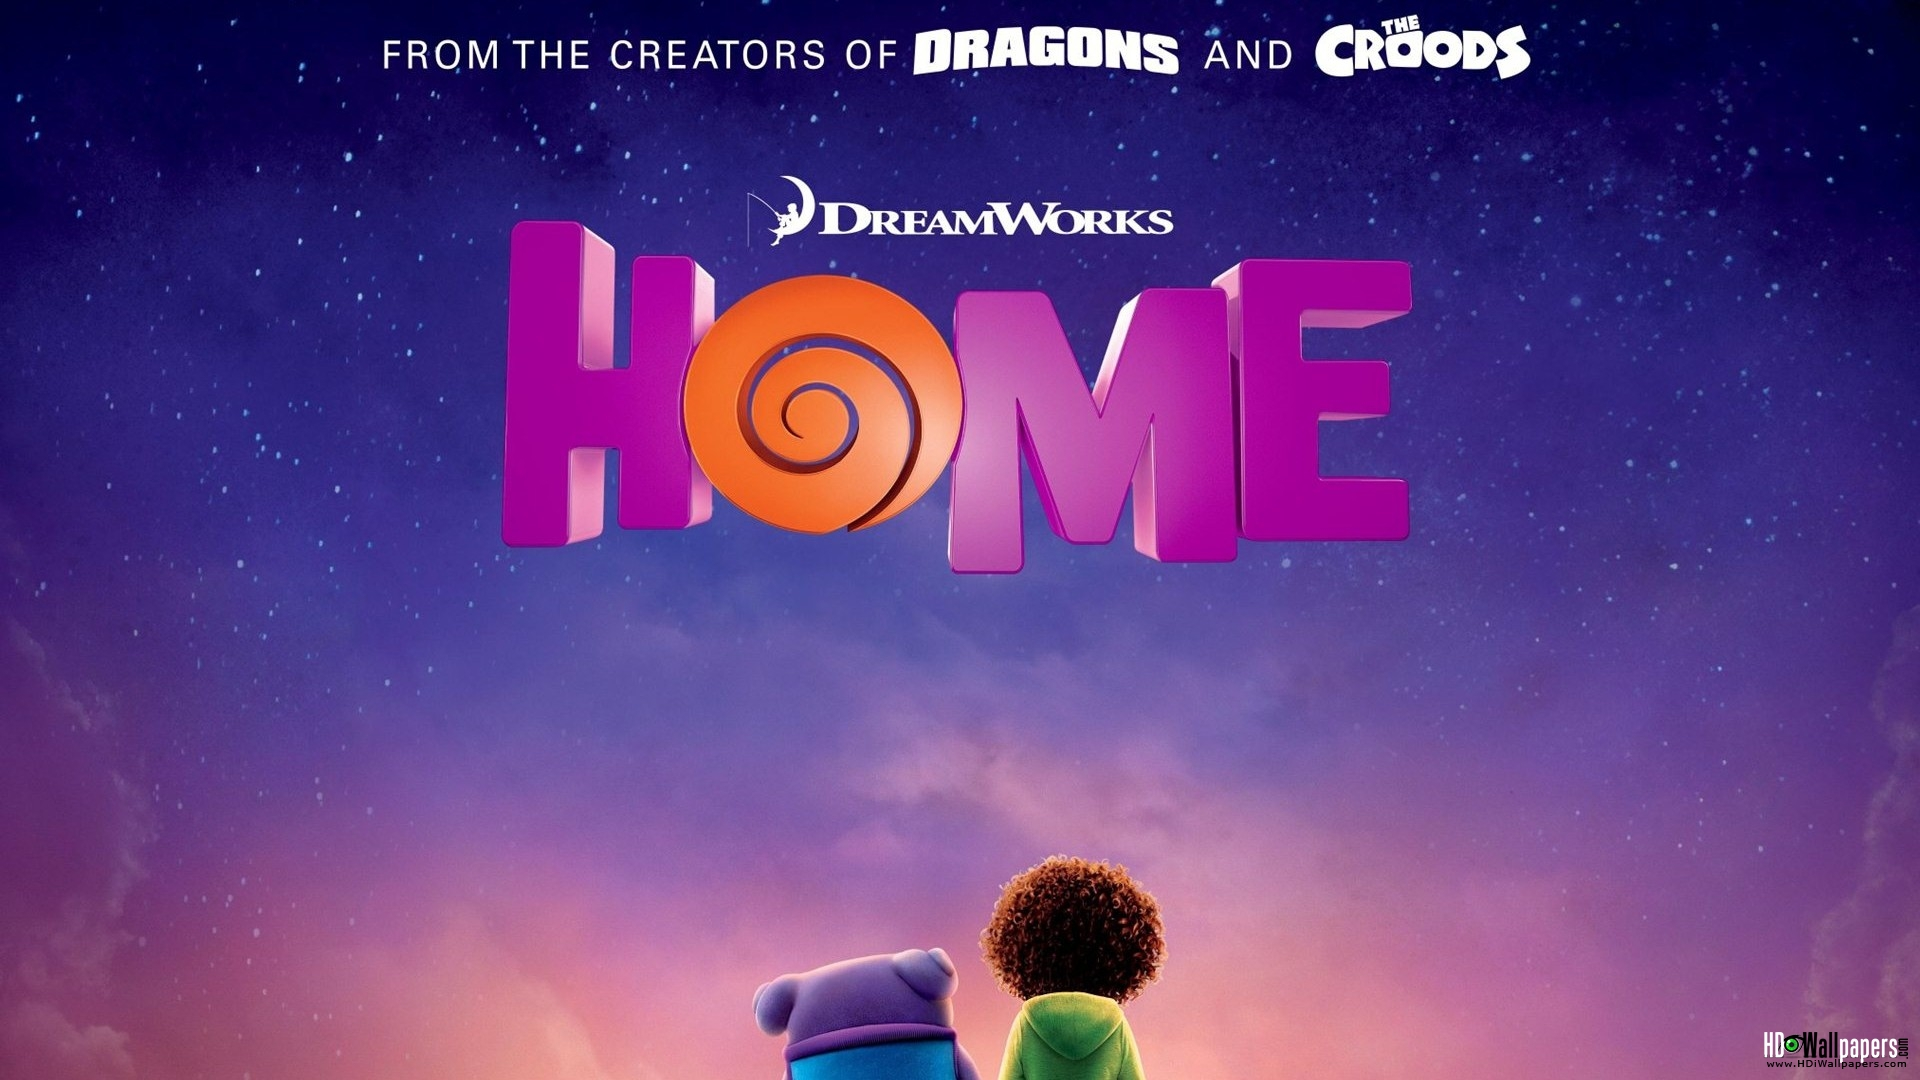 Full Movie Watch OnlineDownload Home 2015 Full Movie HDRip Online 1920x1080